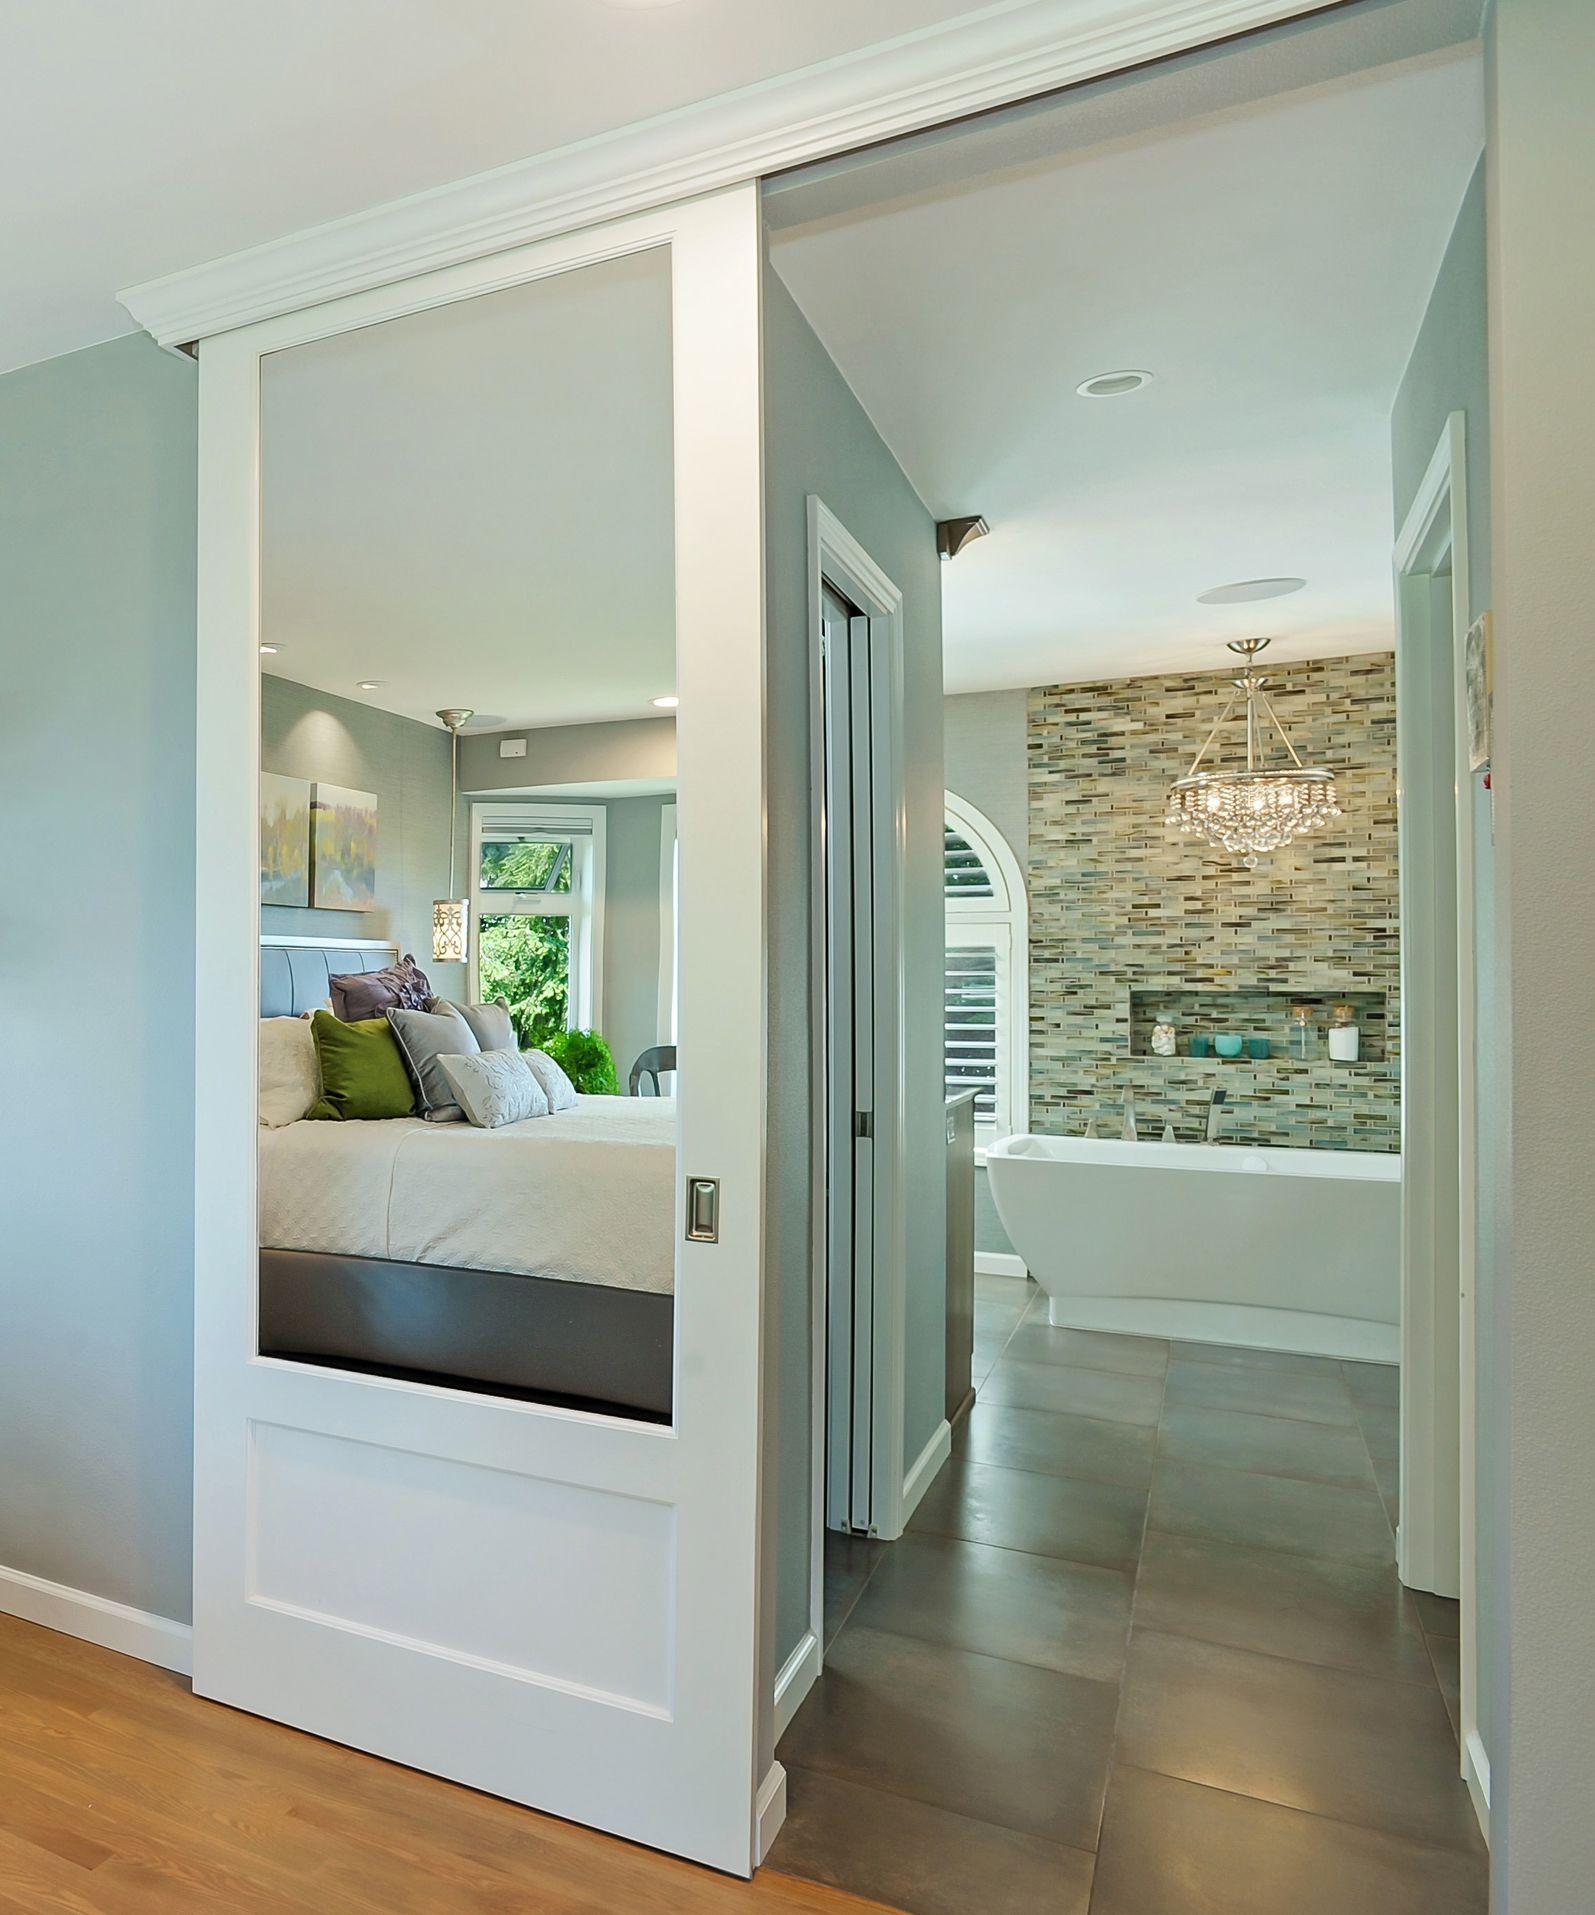 sliding barn door into bath traditional bathroom. Black Bedroom Furniture Sets. Home Design Ideas